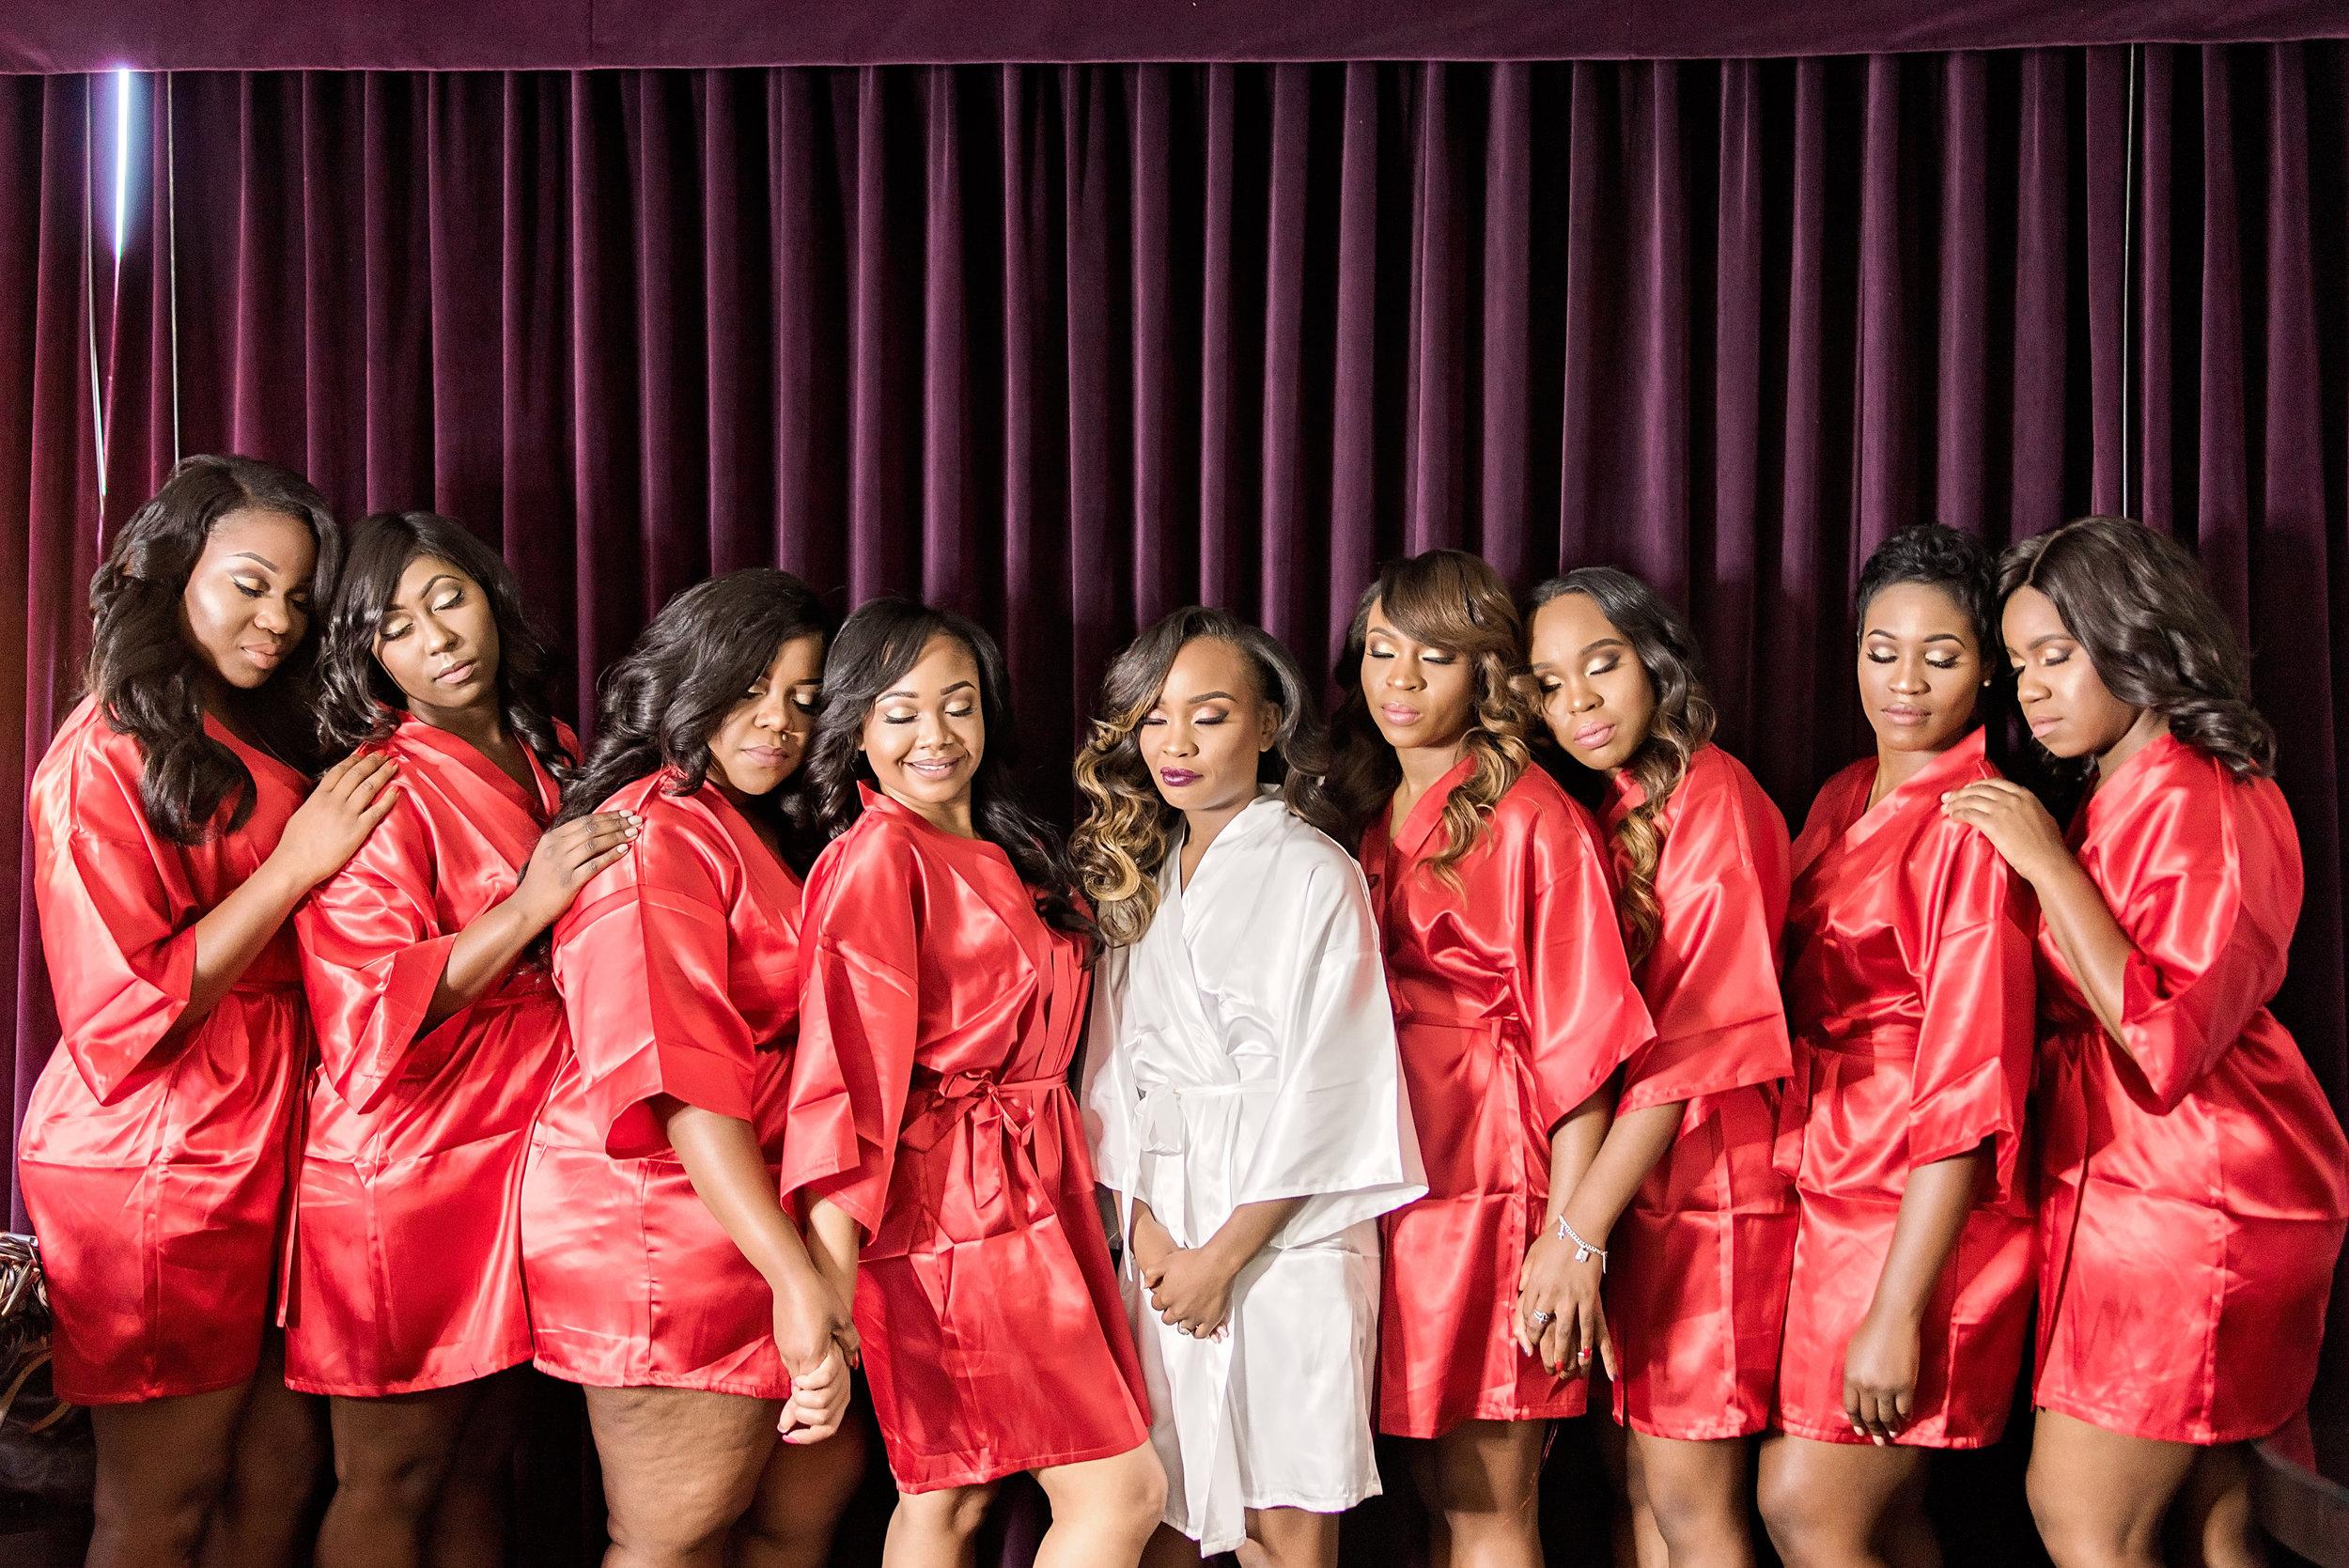 Houston Wedding- Texas Photography- Pharris Photography- Nkechi and Elyx- The Crystal Ballroom- Bridesmaids- Bridesmaids Robes